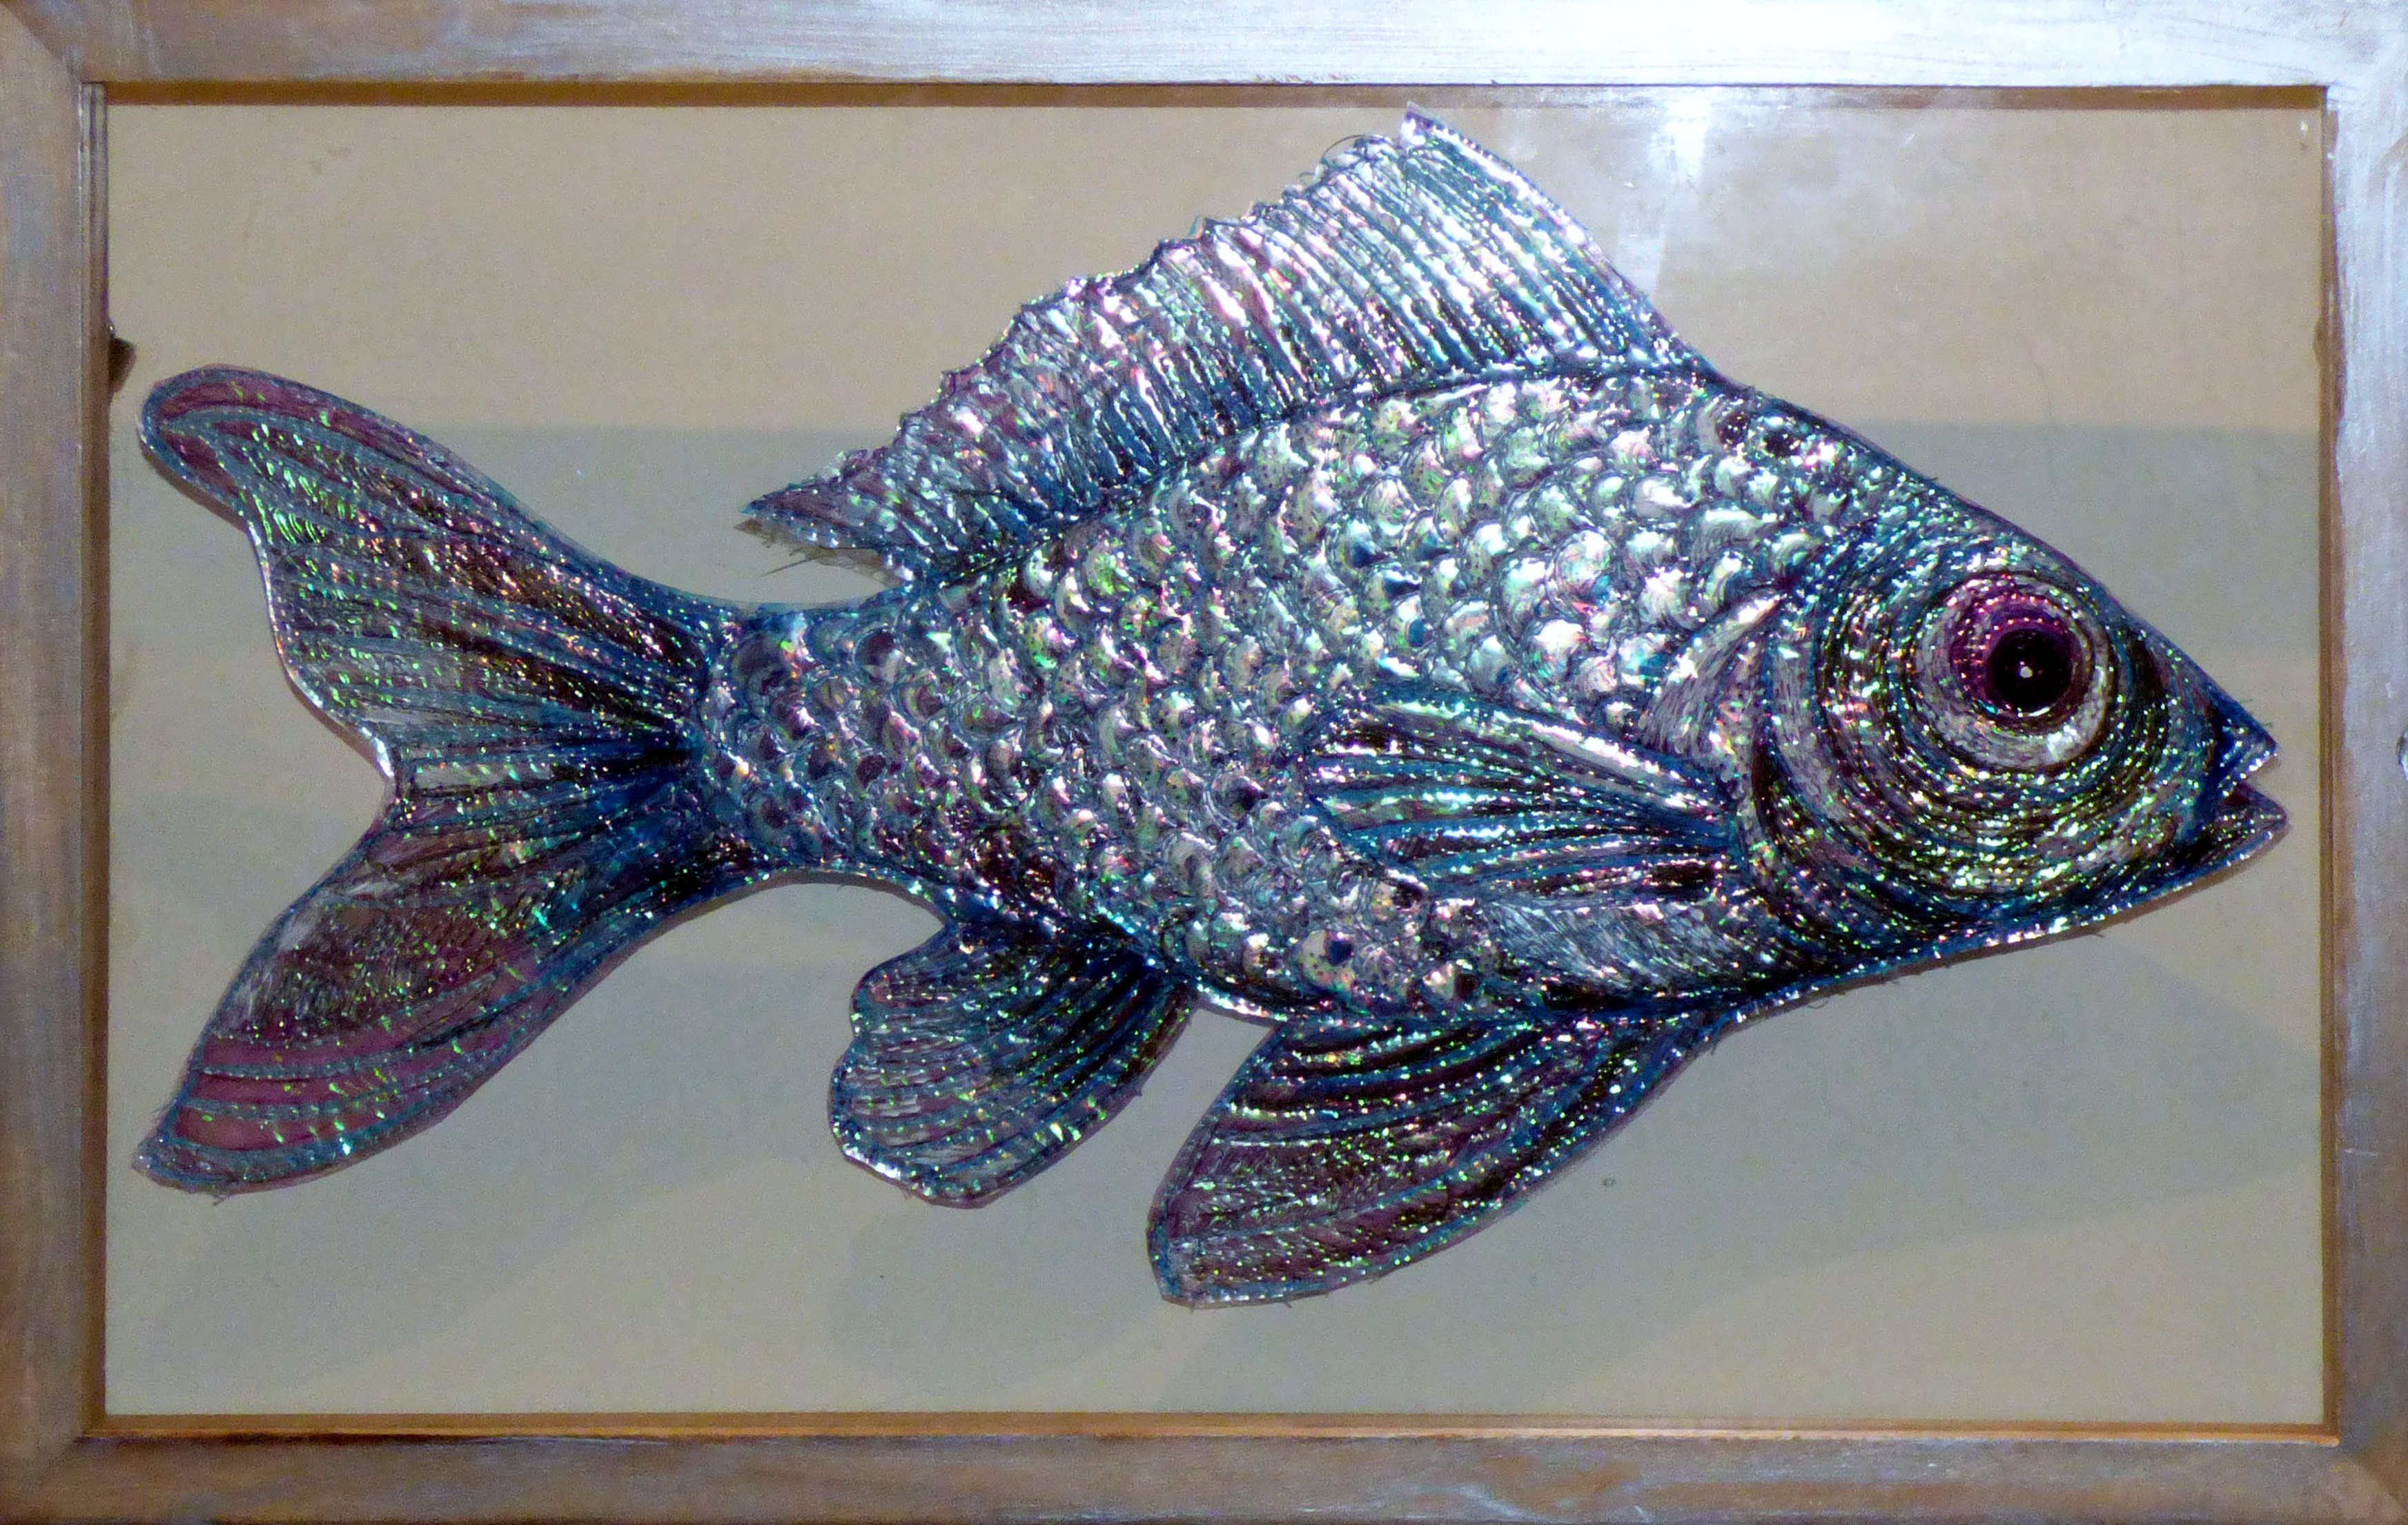 MISS RACHEL'S SILVER FISH by Nikki Parmenter, Gawthorpe Hall, Sept 2020